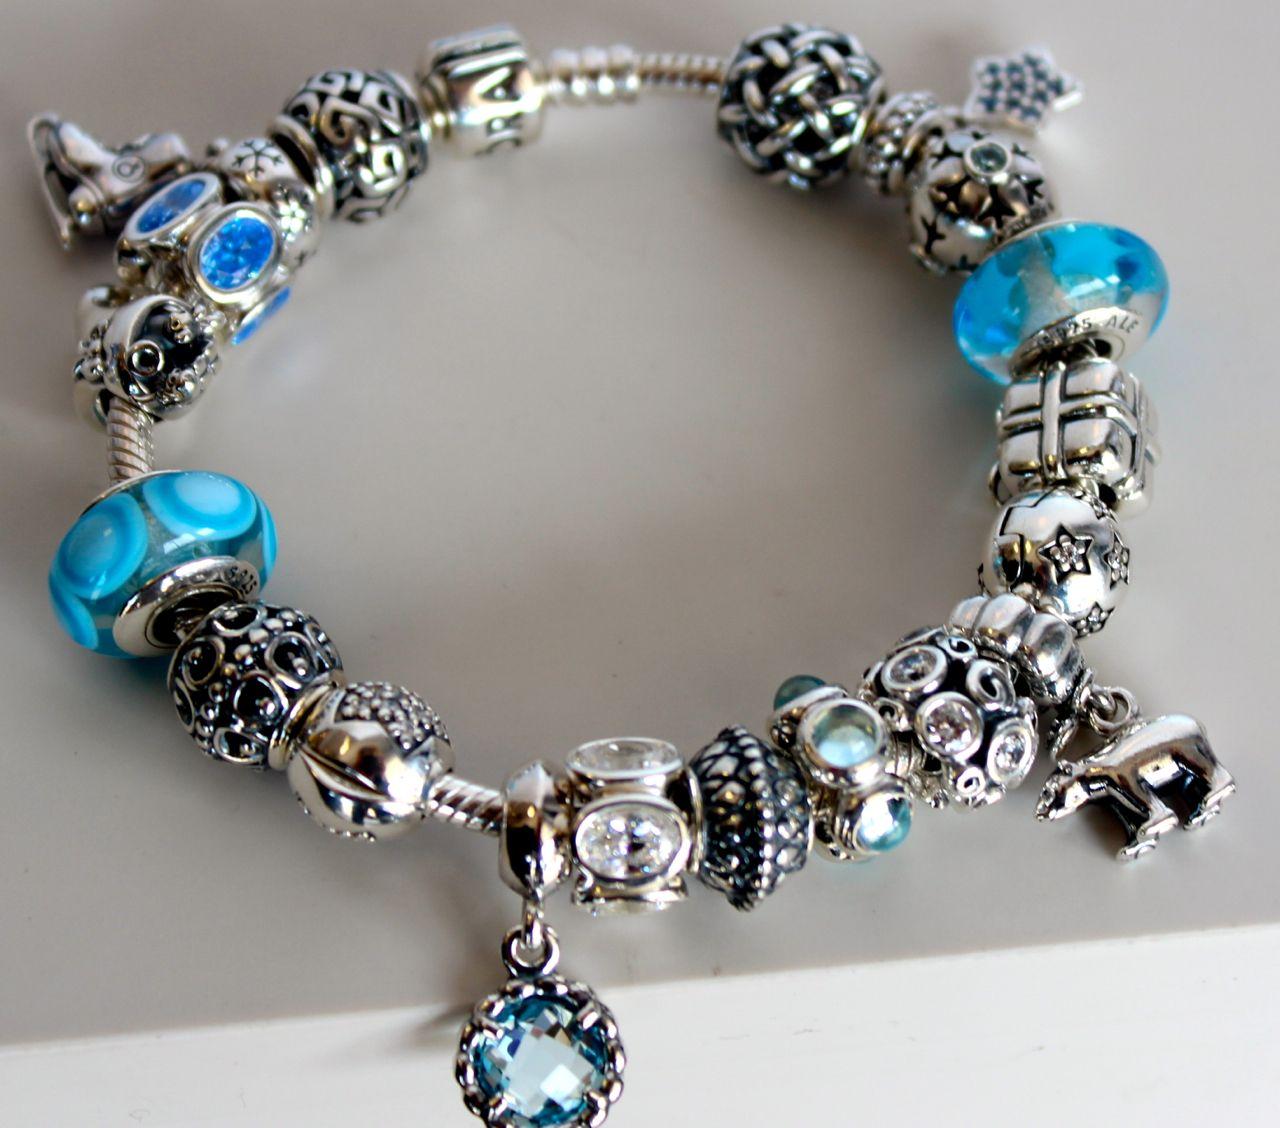 Pandora Bracelet Design Ideas chamilia bracelet design ideas Charm Bracelets Pandora Charm Bracelet I Love Them So Much That My Medical Alert Tag Is A Charm Bracelet Things I Love Pinterest Pandora